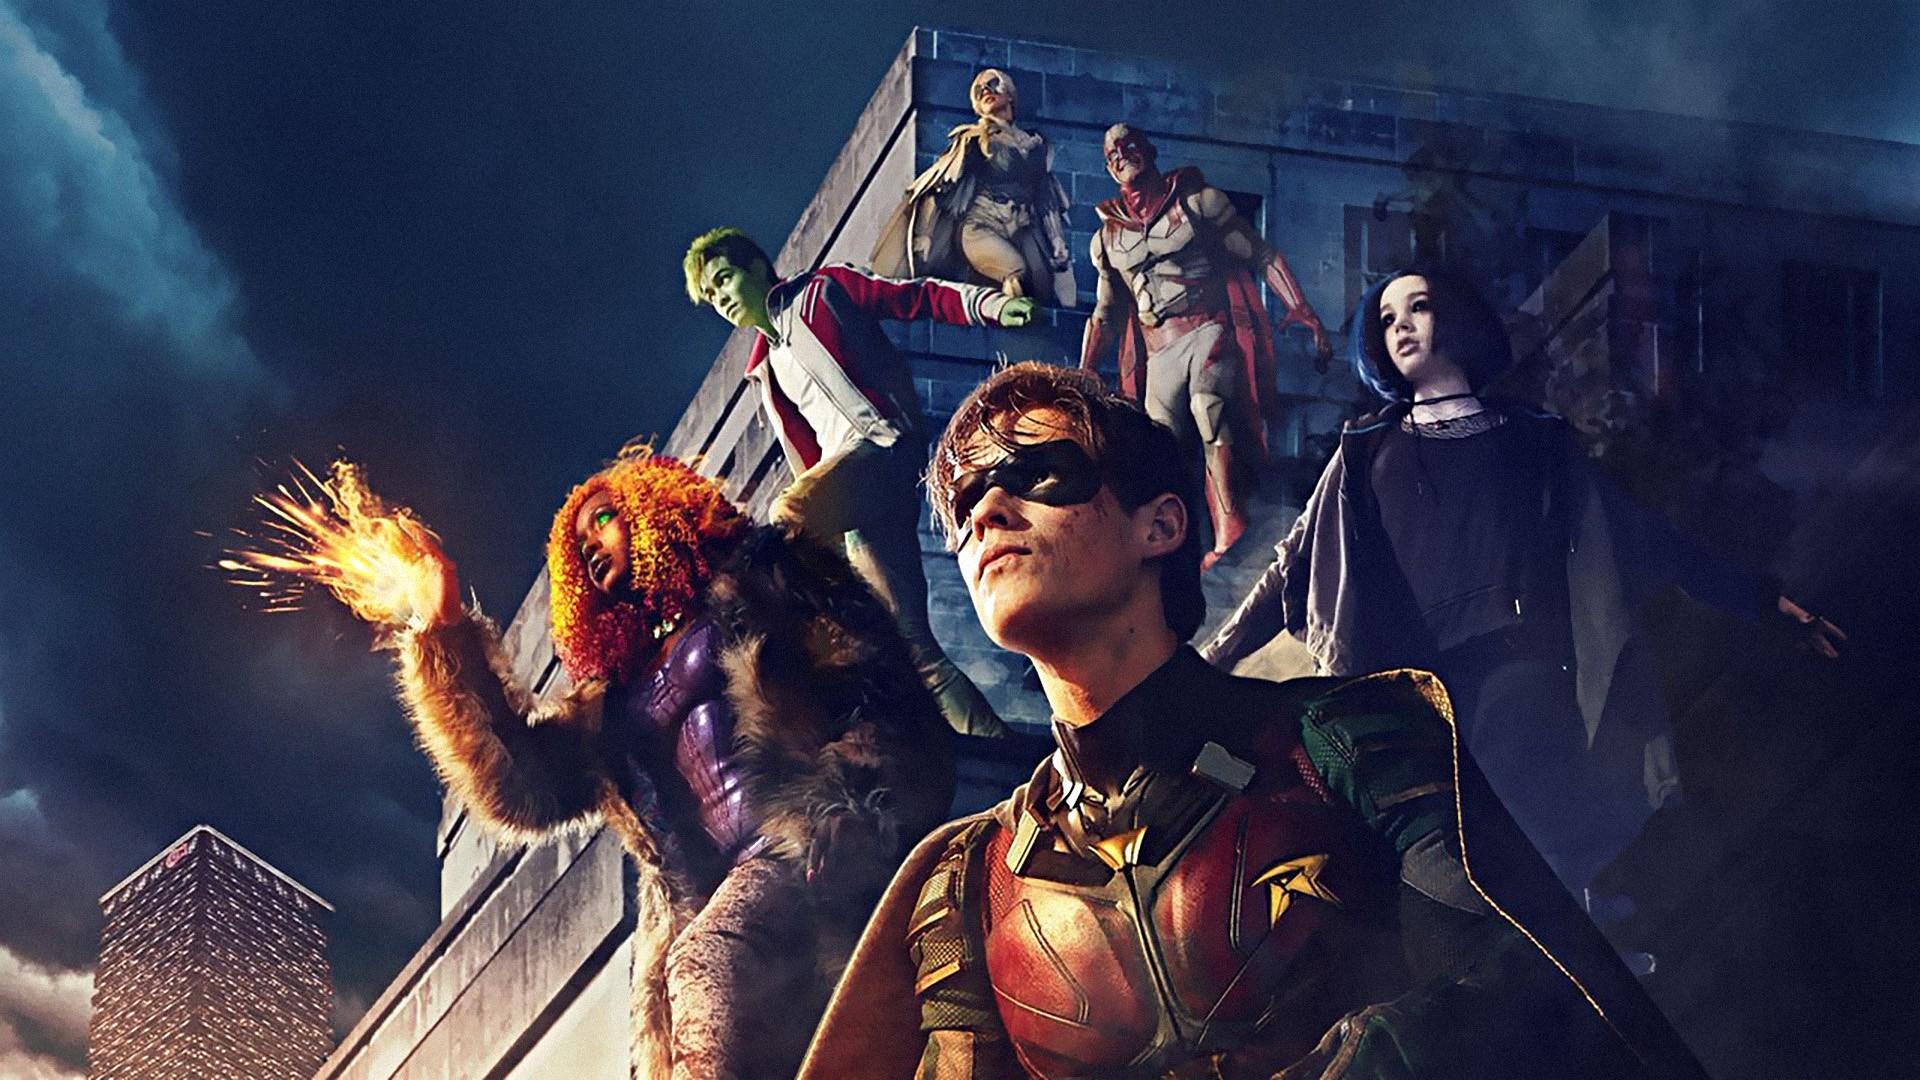 Review Titans Season 2 Episode 1 Chaos Pop Damaris lewis as blackfire 6. review titans season 2 episode 1